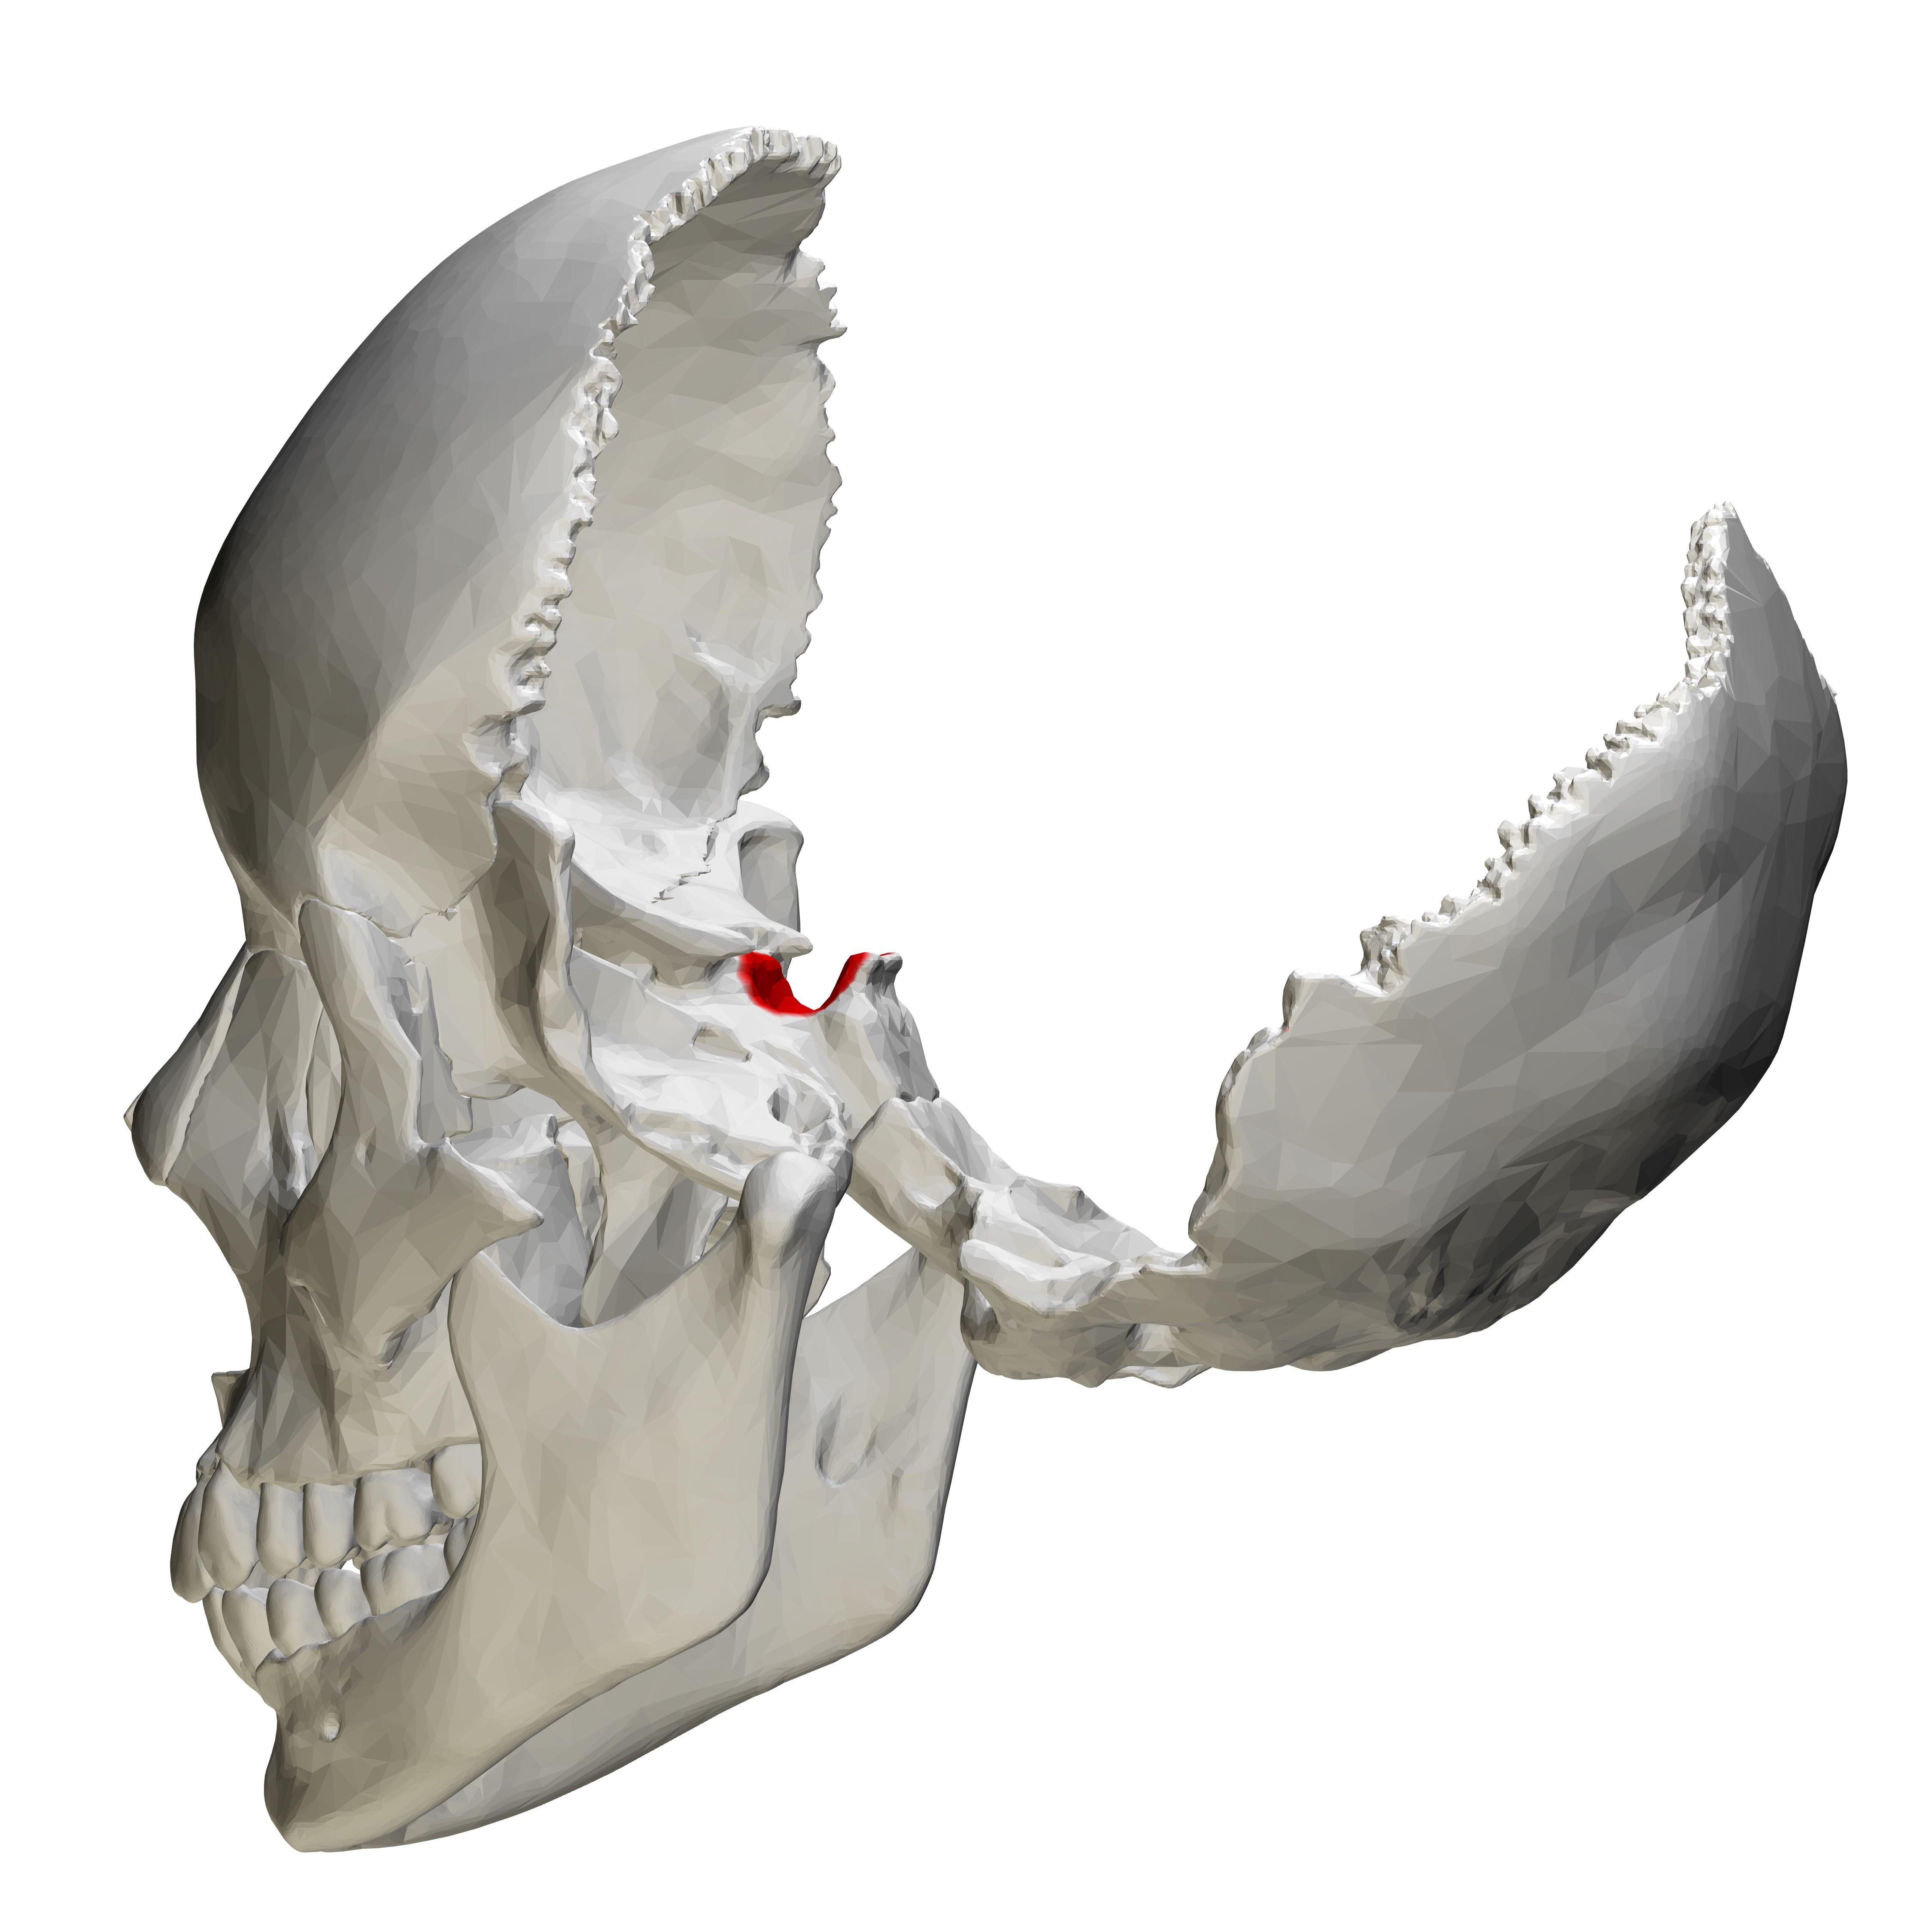 Pin de Stelios Daskalogiannis en cranio | Pinterest